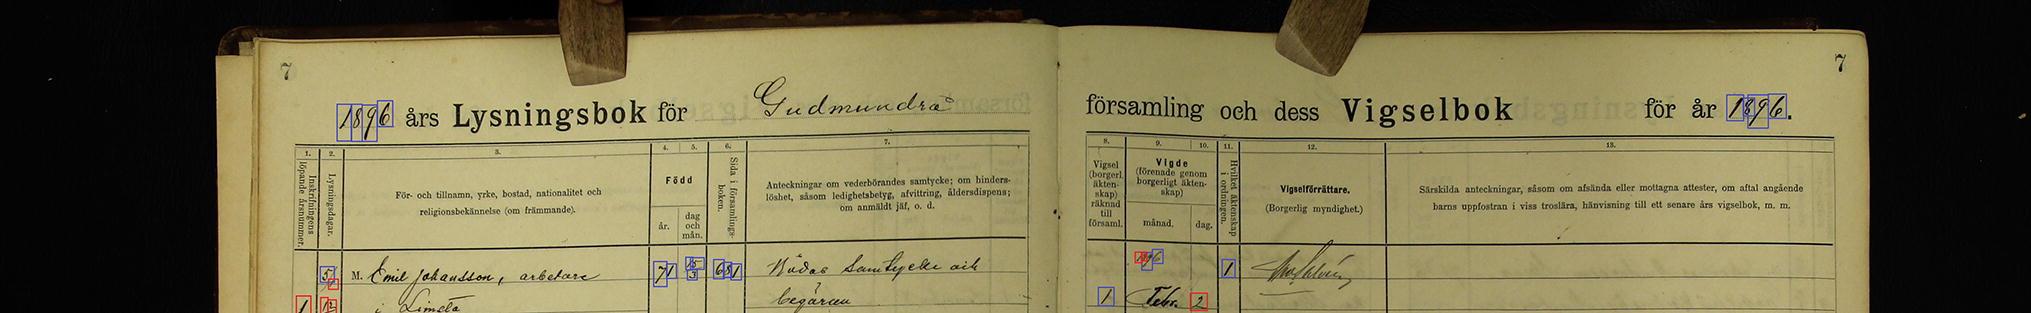 ARDIS: a Swedish historical handwritten digit dataset | SpringerLink